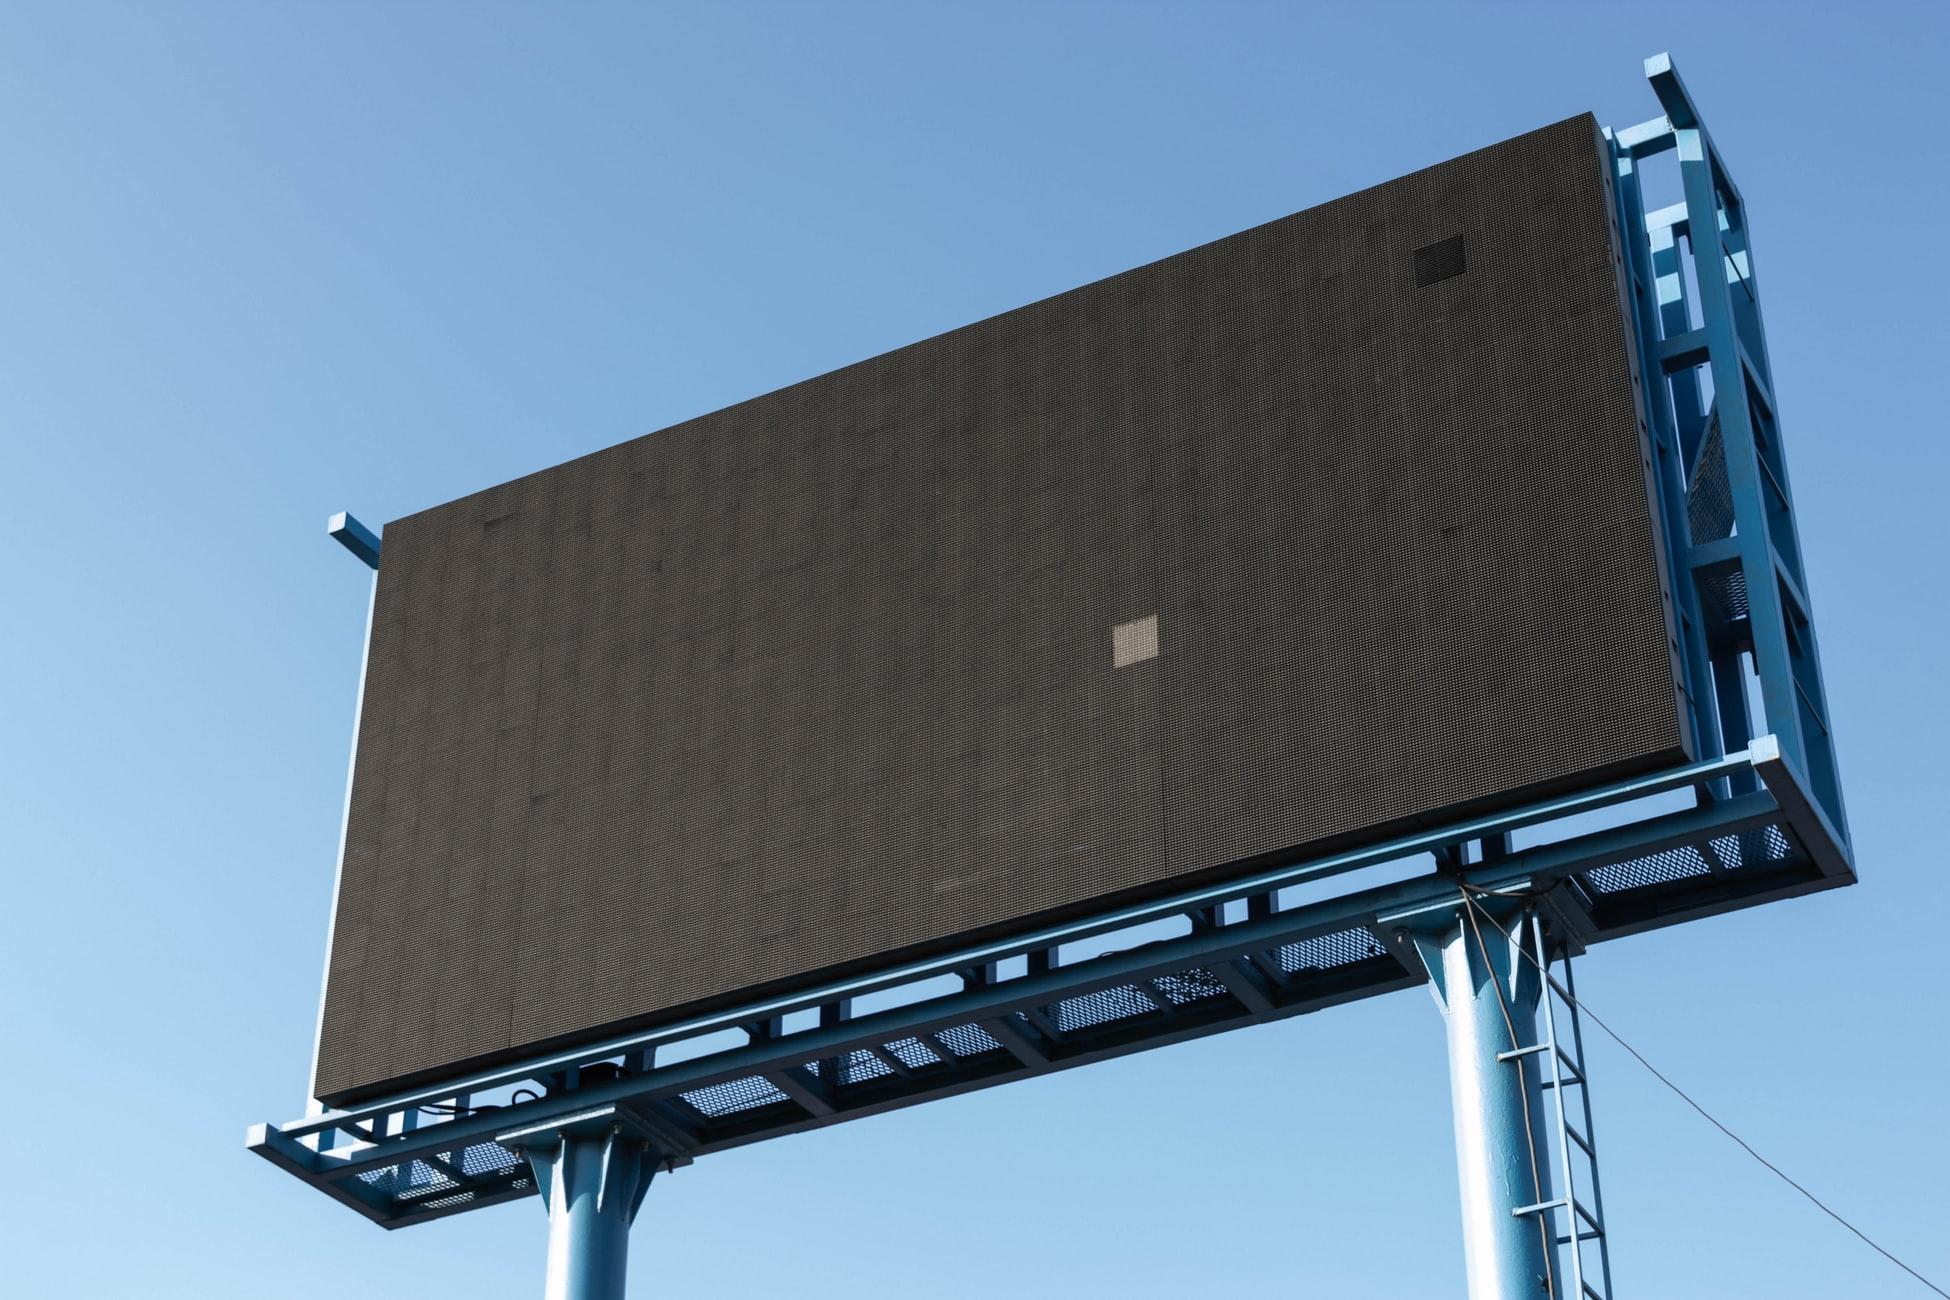 Billboard with RGB LED panel displays